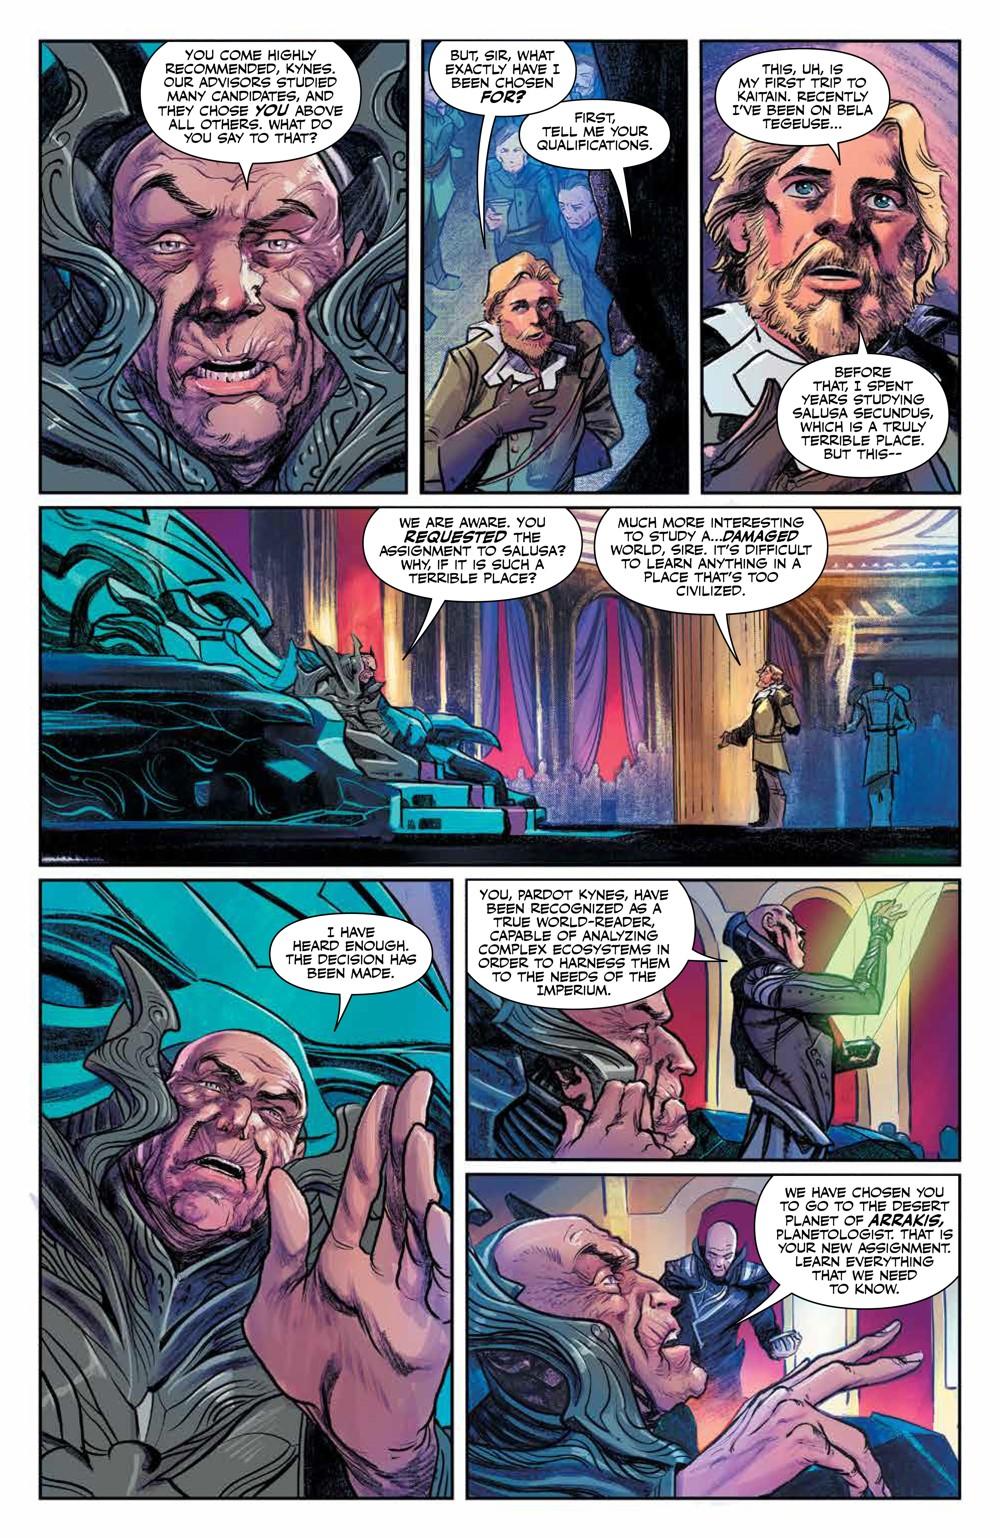 Dune_HouseAtreides_v1_HC_PRESS_15 ComicList Previews: DUNE HOUSE ATREIDES VOLUME 1 HC